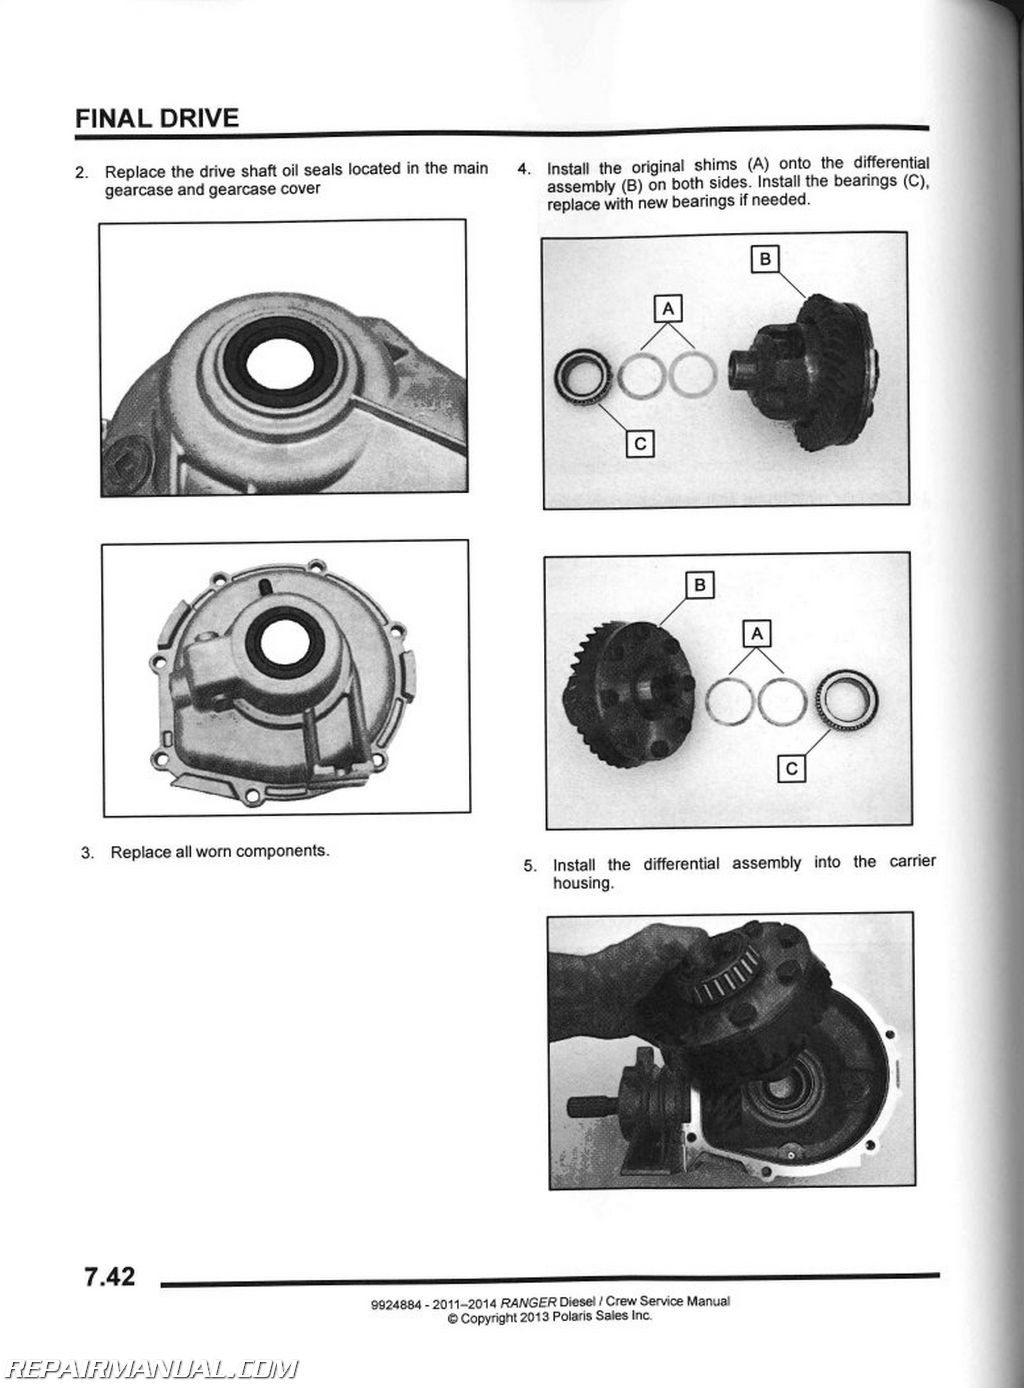 Polaris Ranger Diesel Crew Utv Service Manual Page on Diesel Golf Engine Diagram